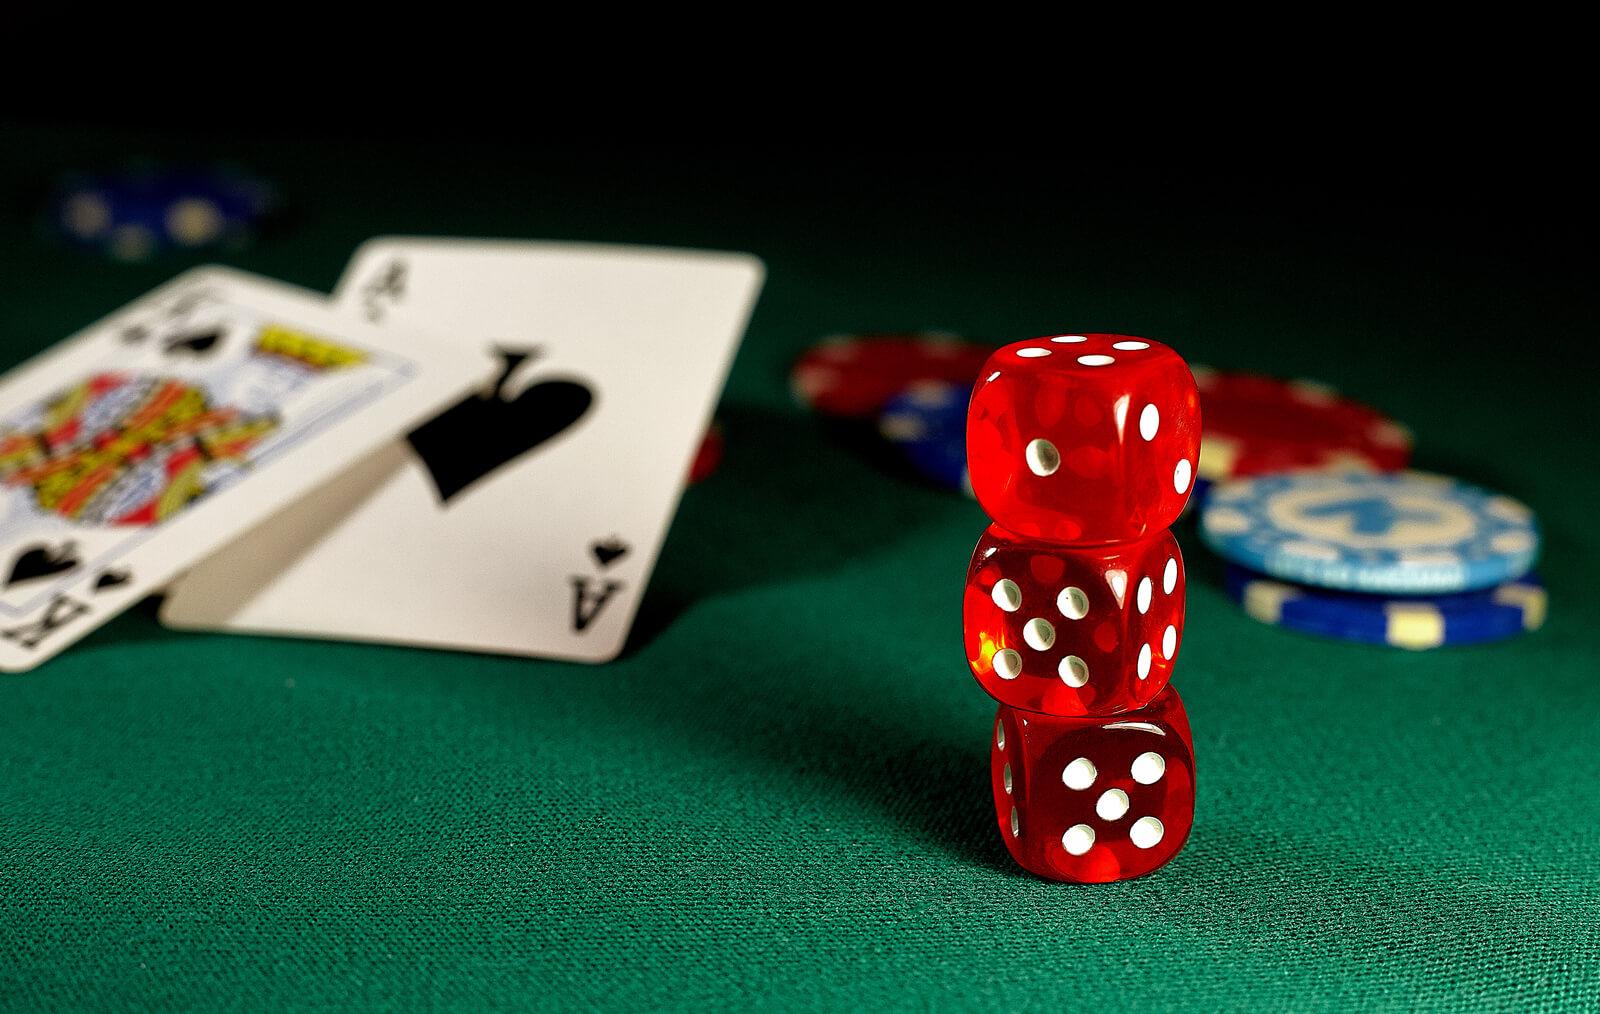 Gambling Casino Poker Table Card Game